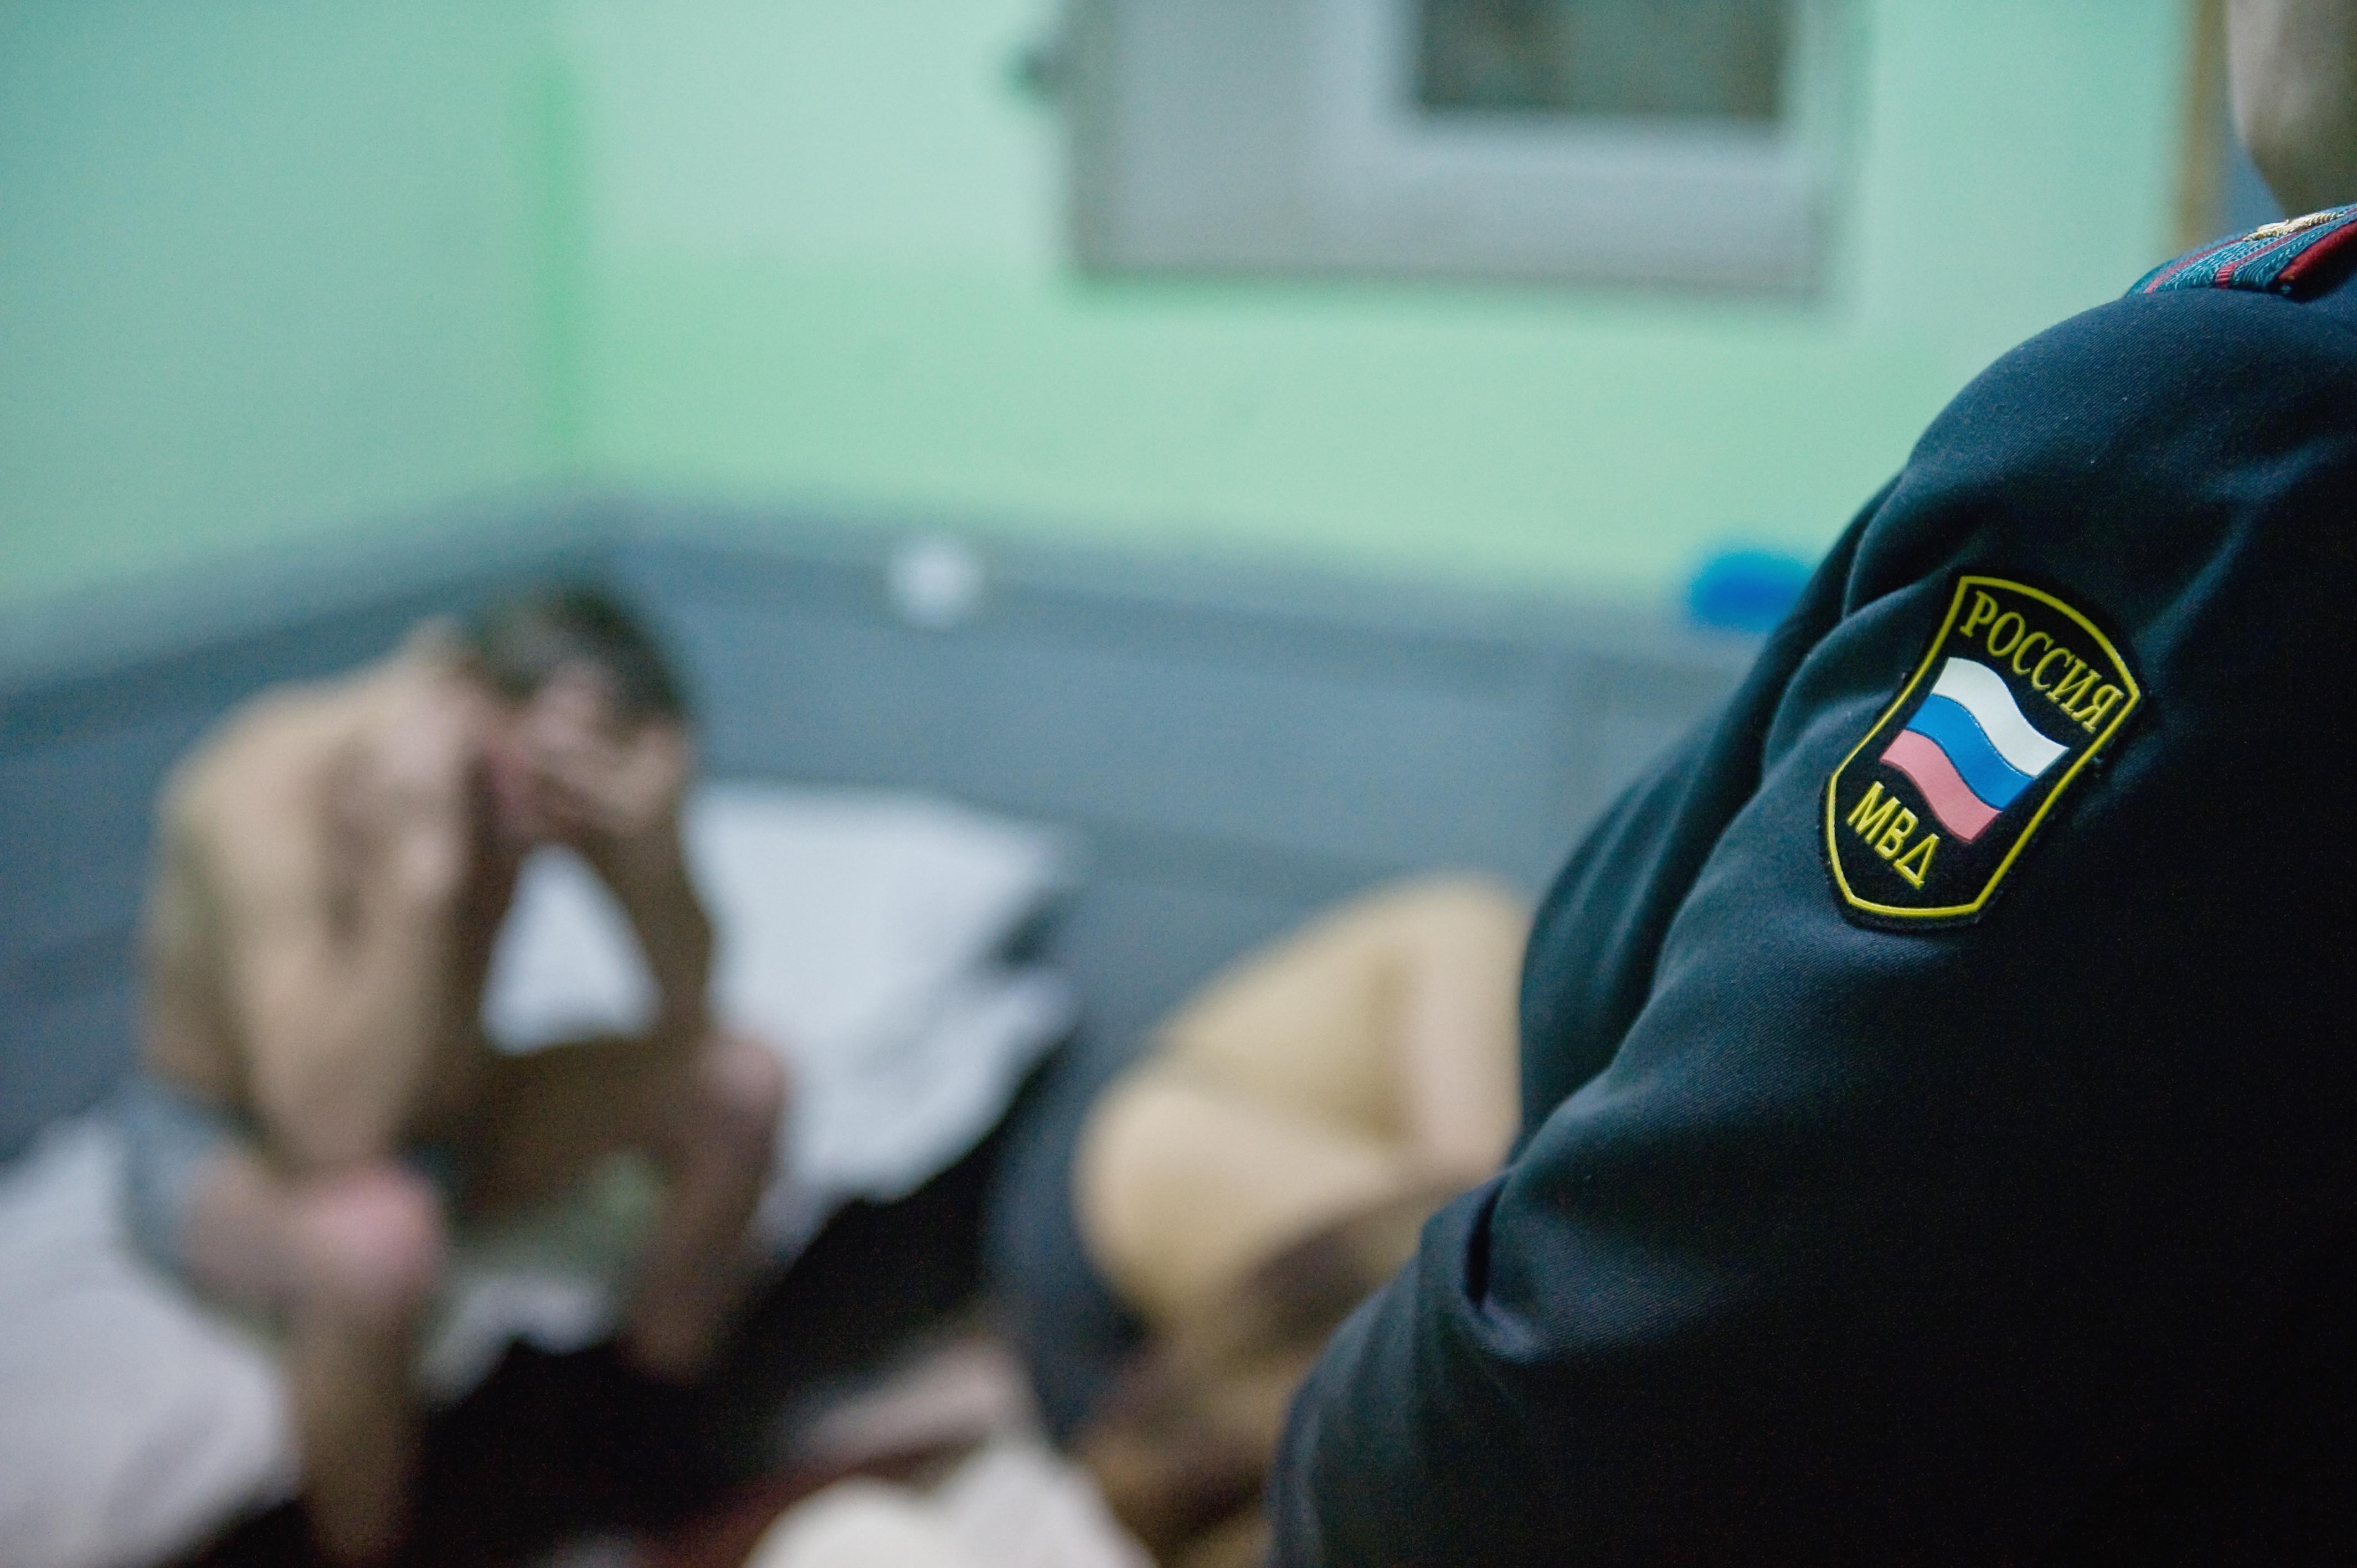 <p>Фото: &copy; РИА Новости/Григорий Сысоев</p>